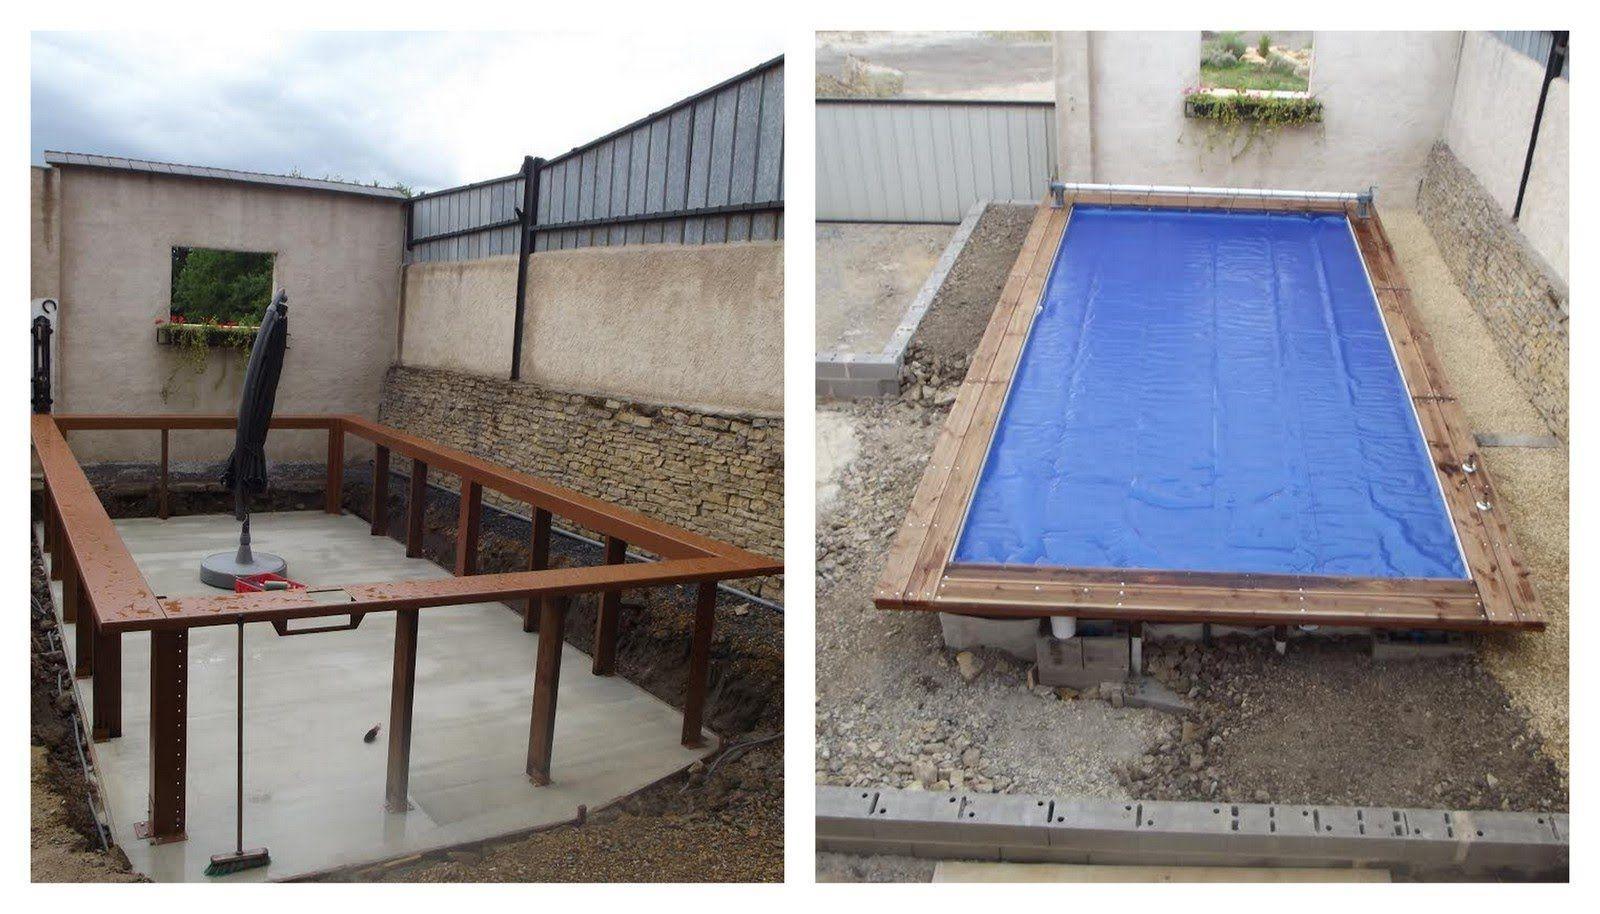 piscine hors sol france - Piscine Hors Sol France